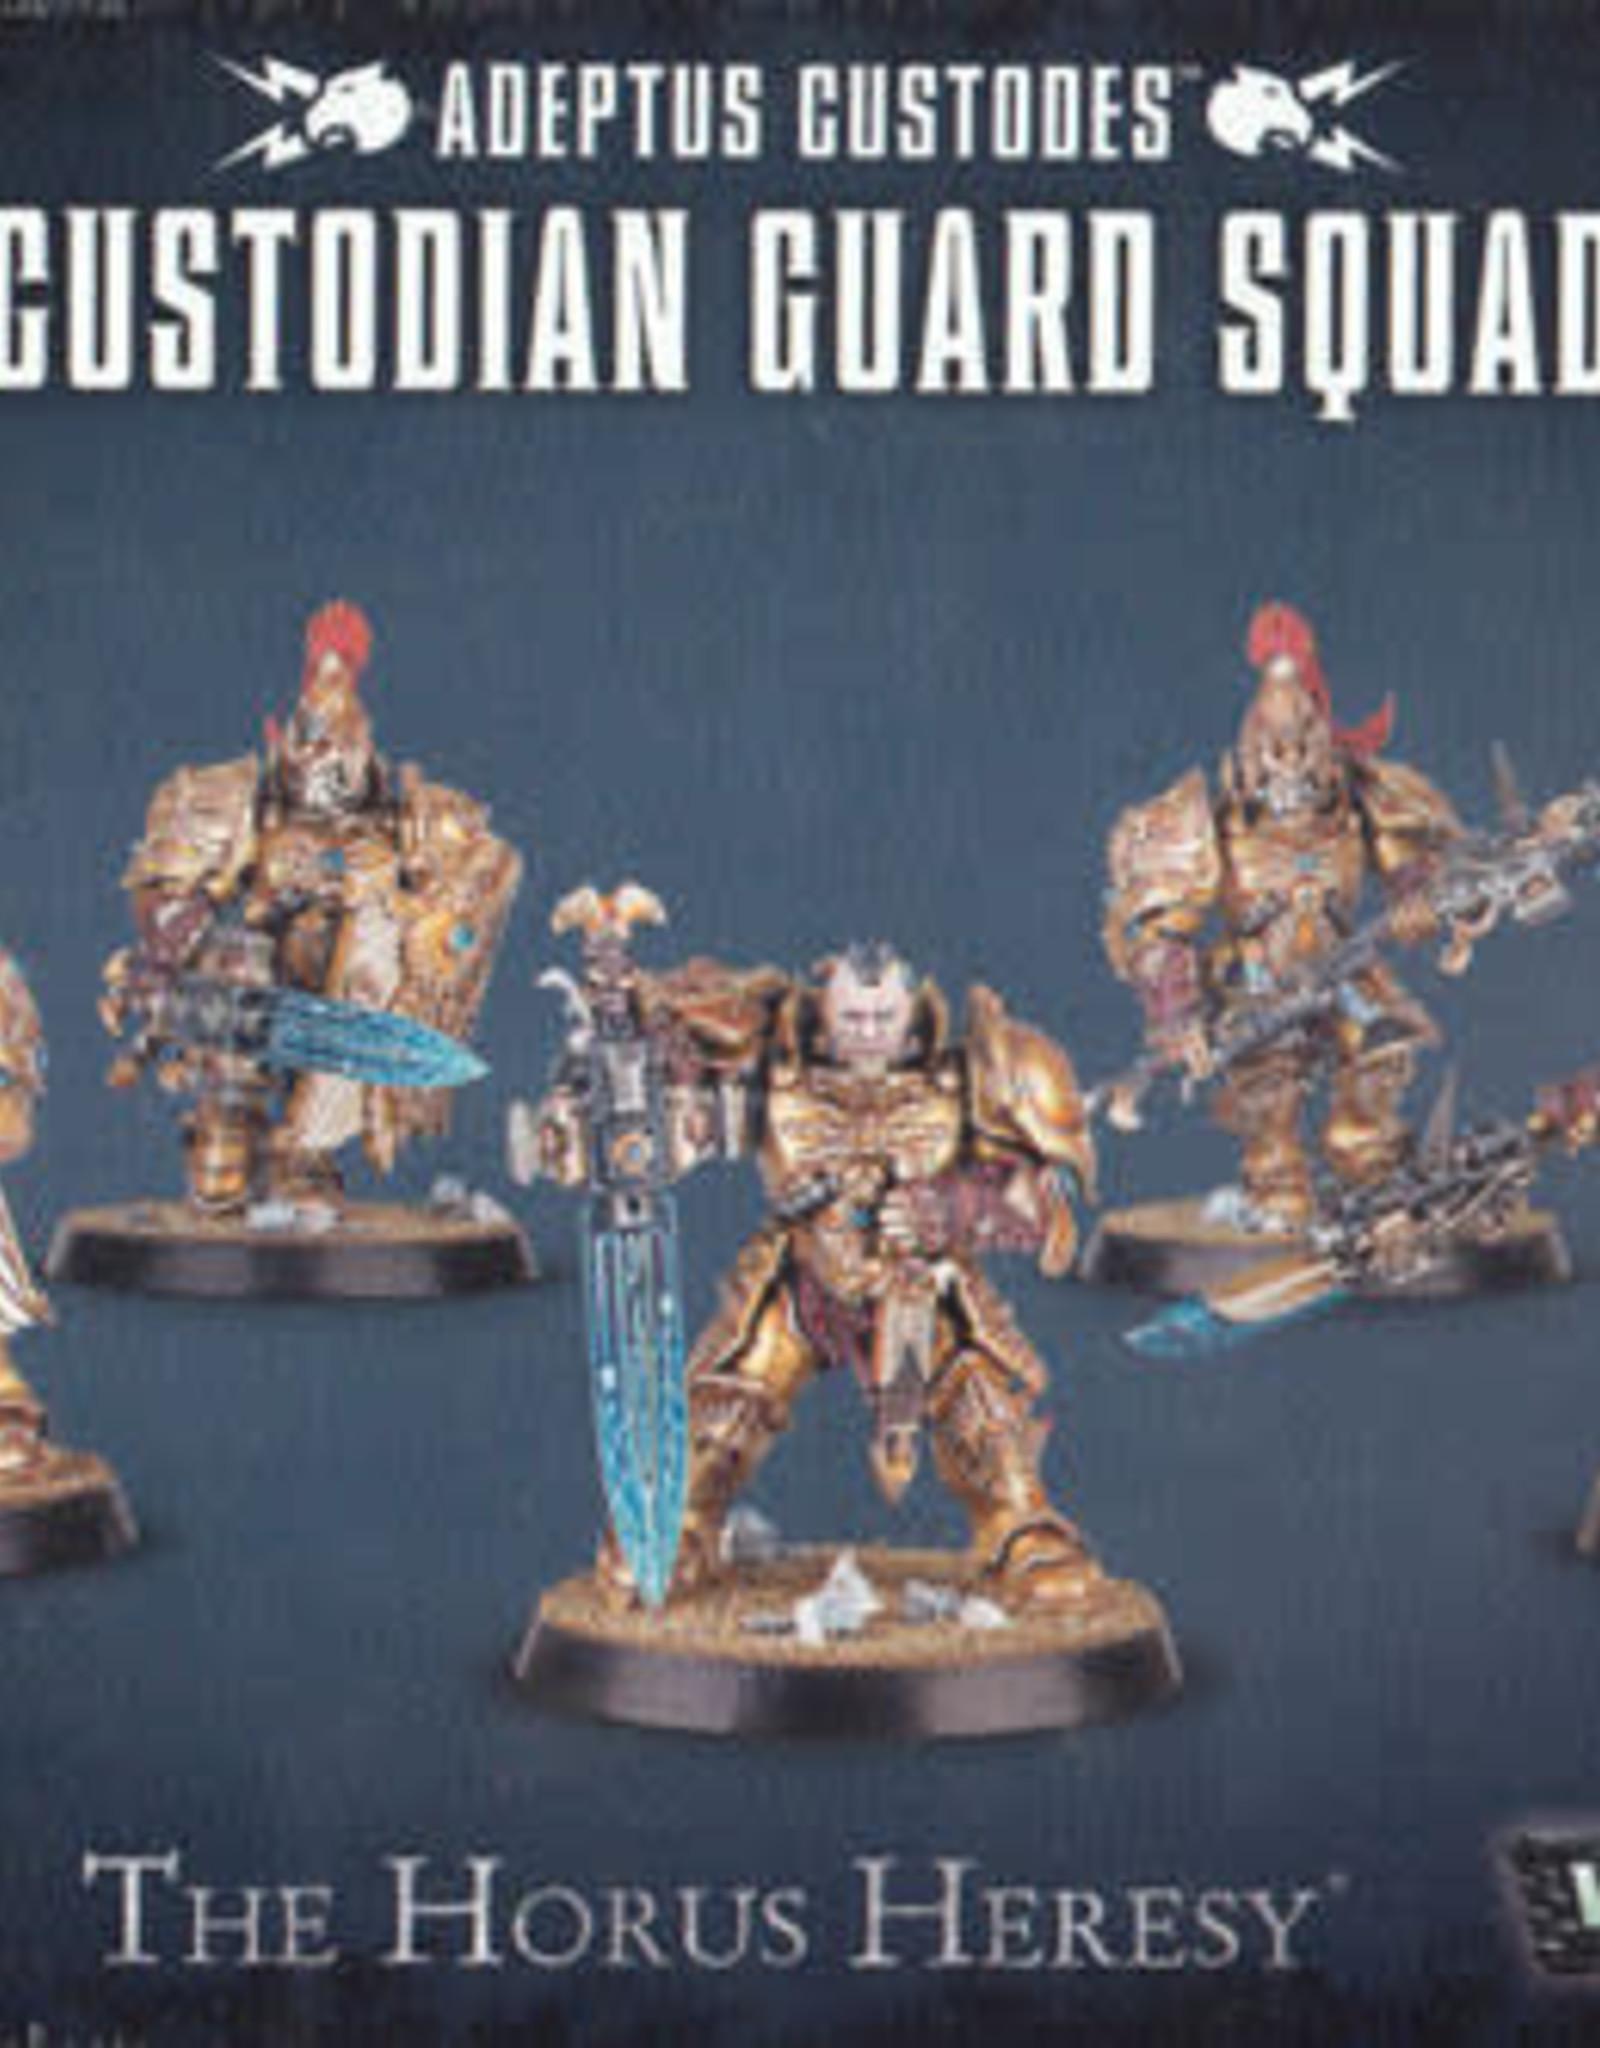 Warhammer 40K Adeptus Custodes Custodian Guard